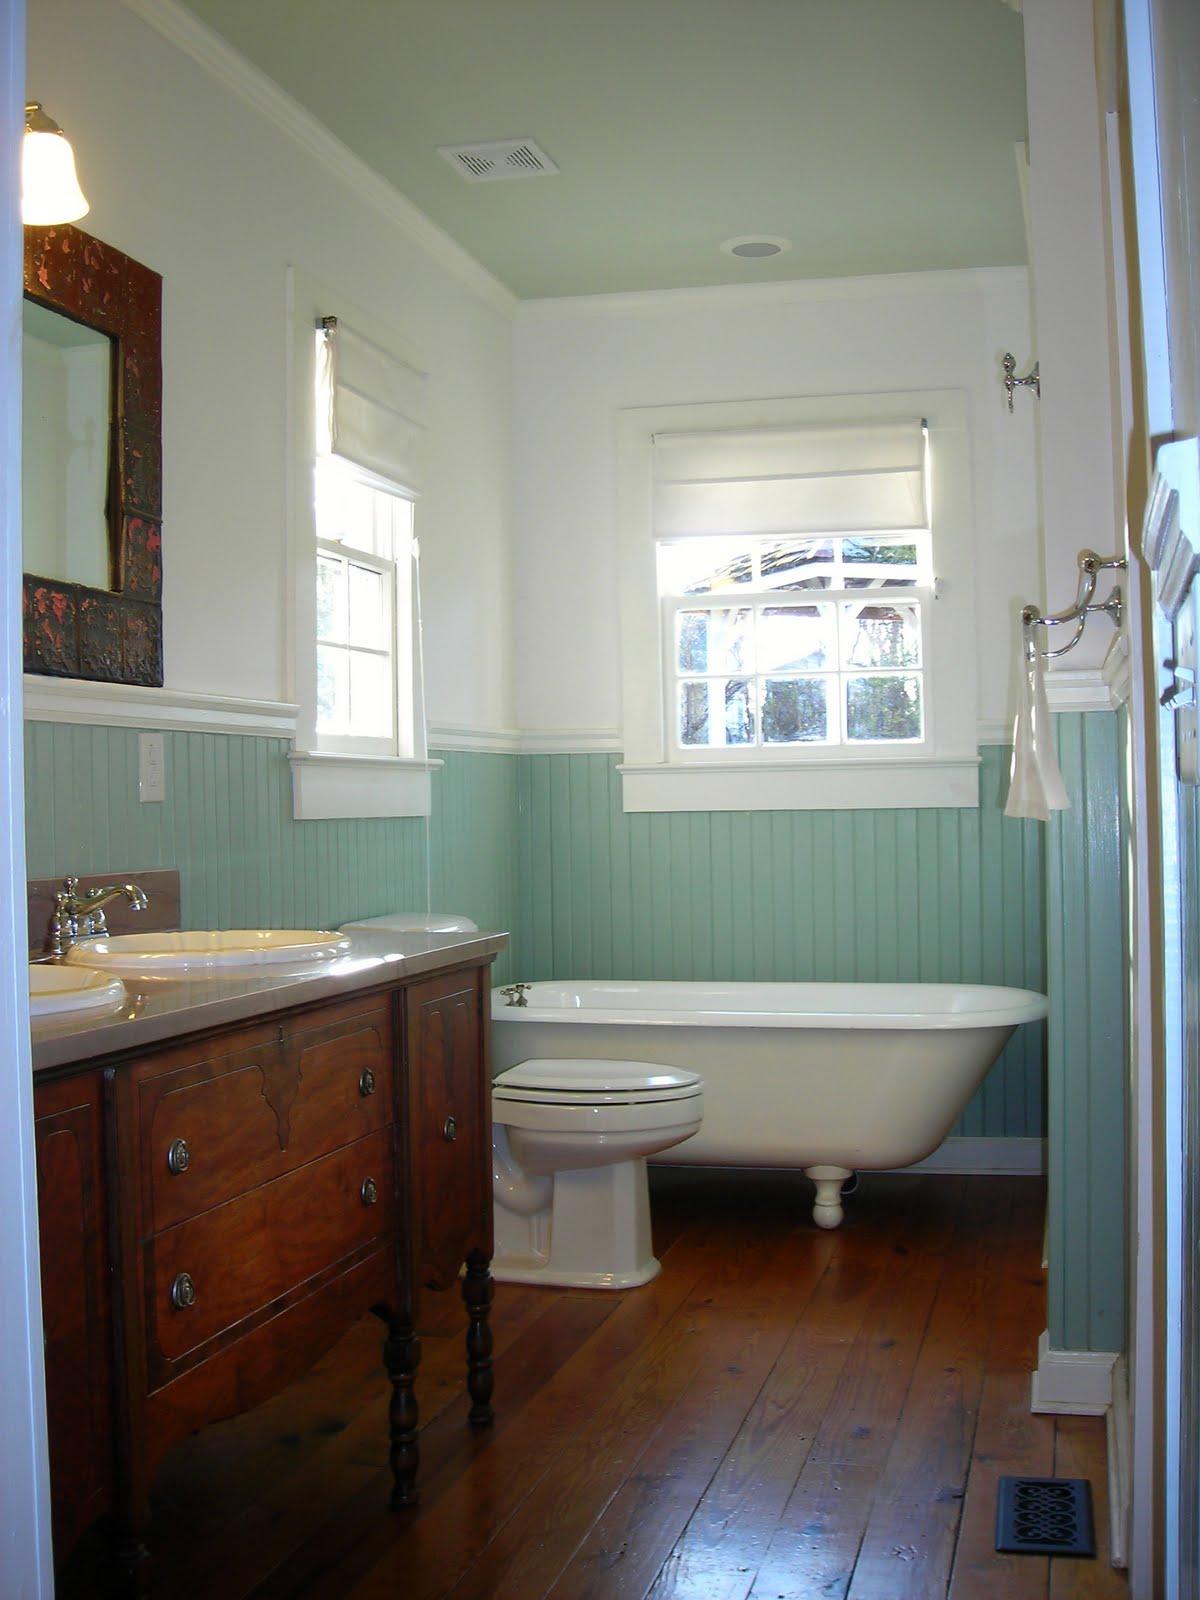 Practical Master Bathroom Ideas: Bathroom Of The Week: Practical Vs. Pretty